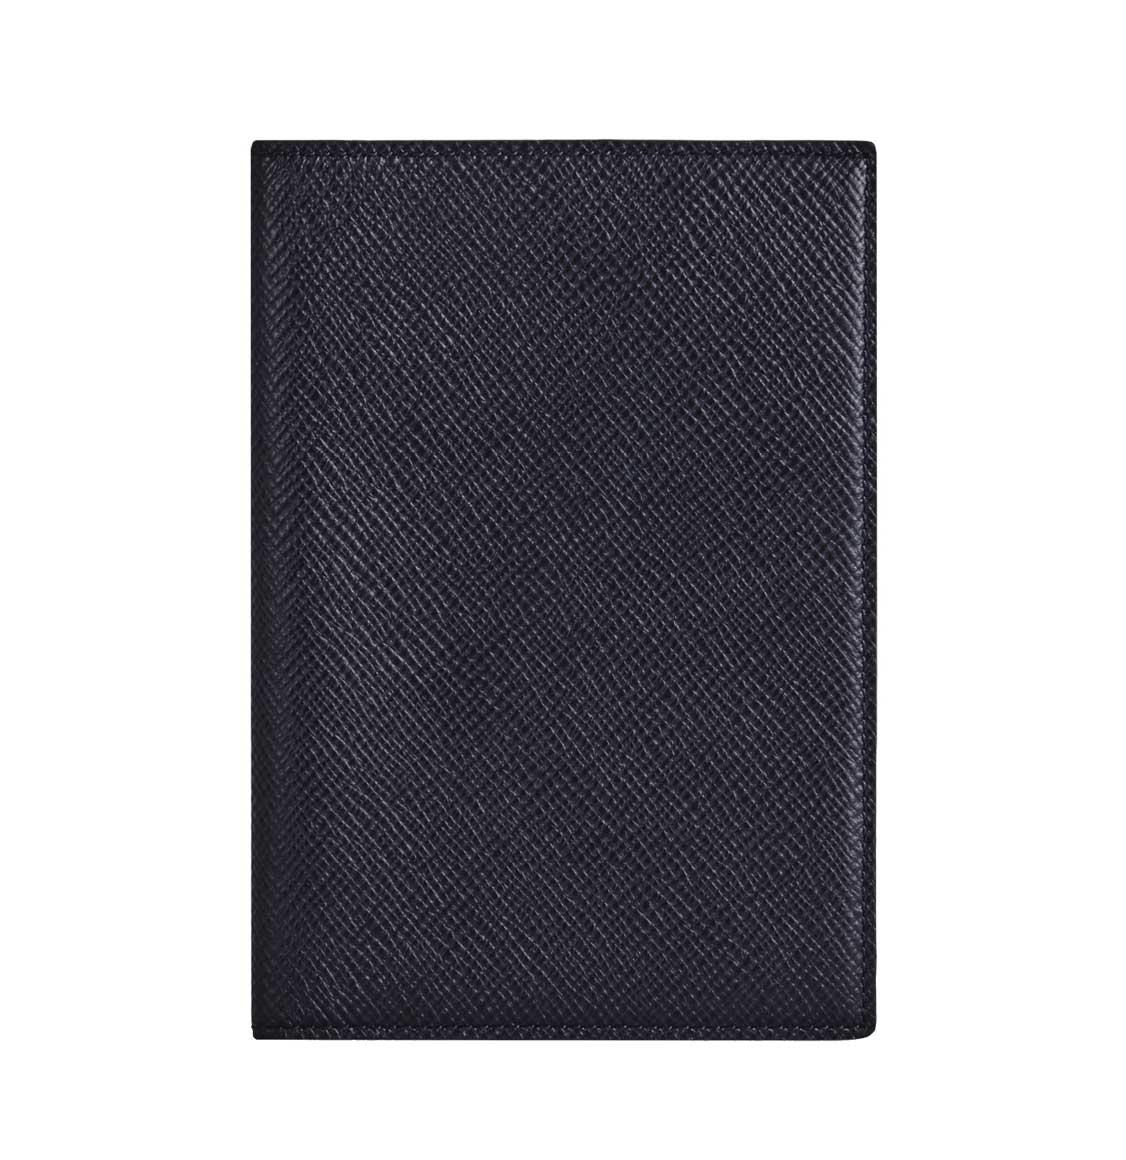 Smythson Panama Cross-Grain Leather Passport Cover Navy Blue